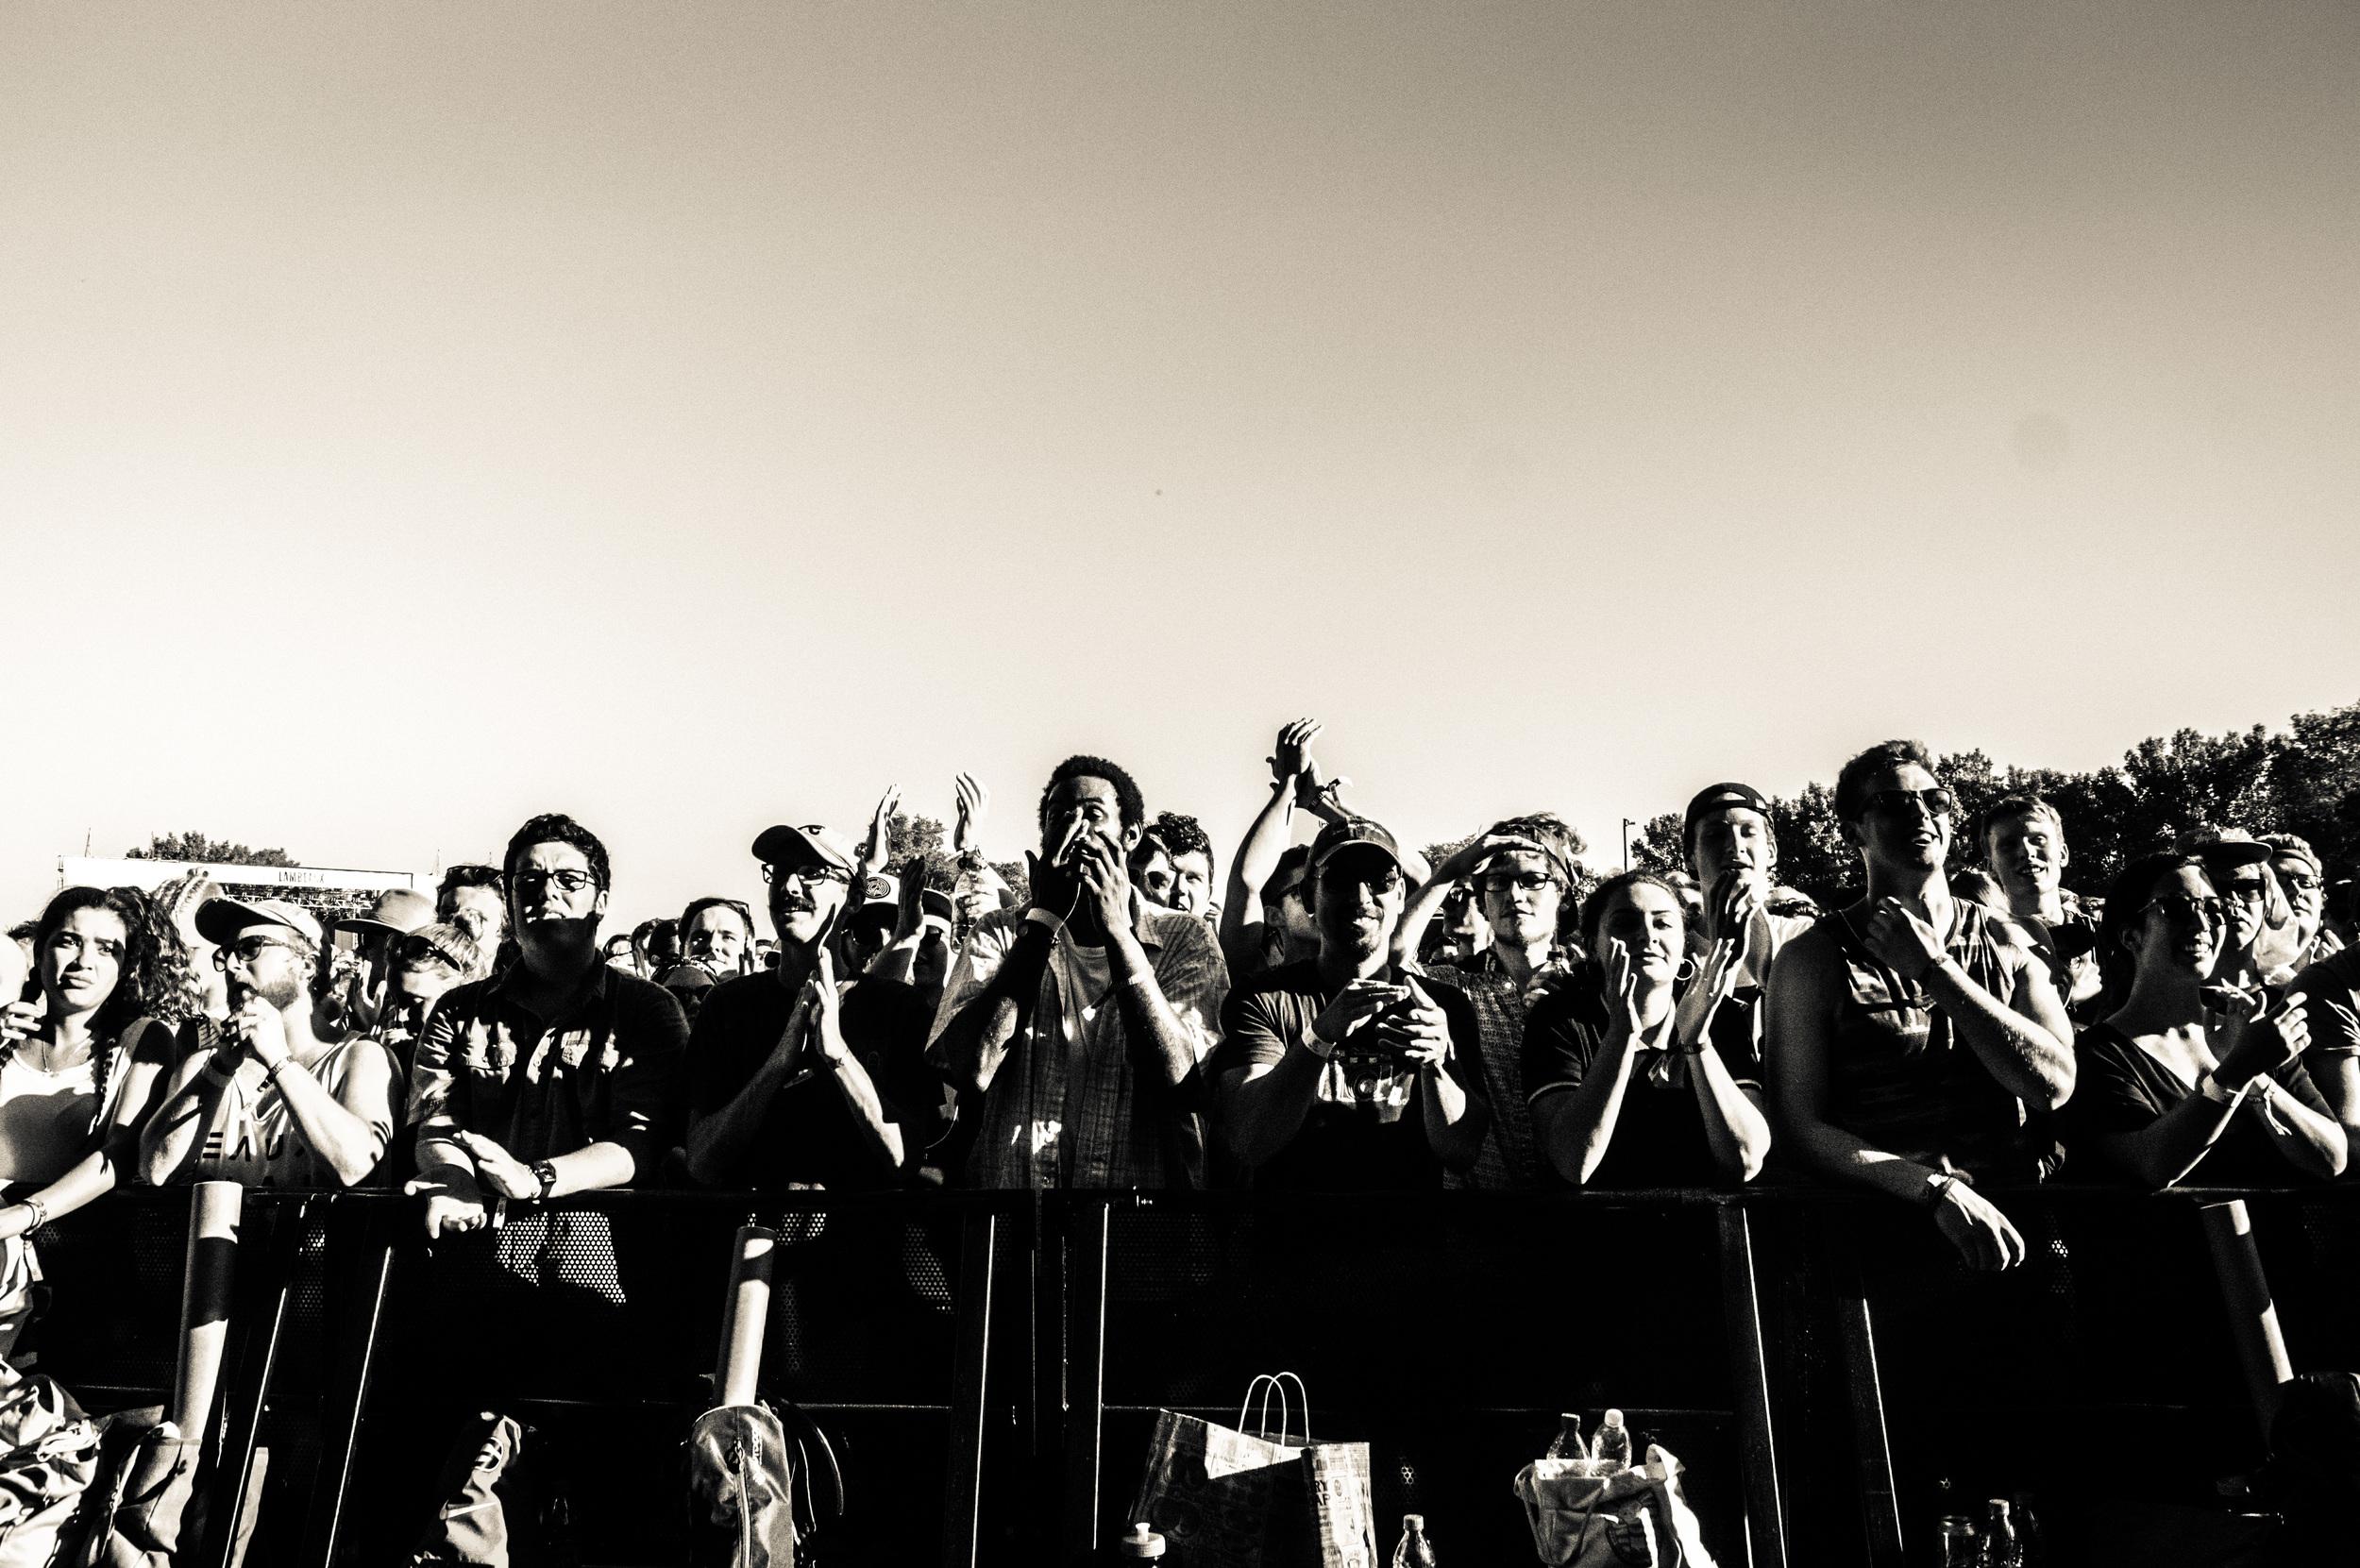 crowd 6-2.jpg